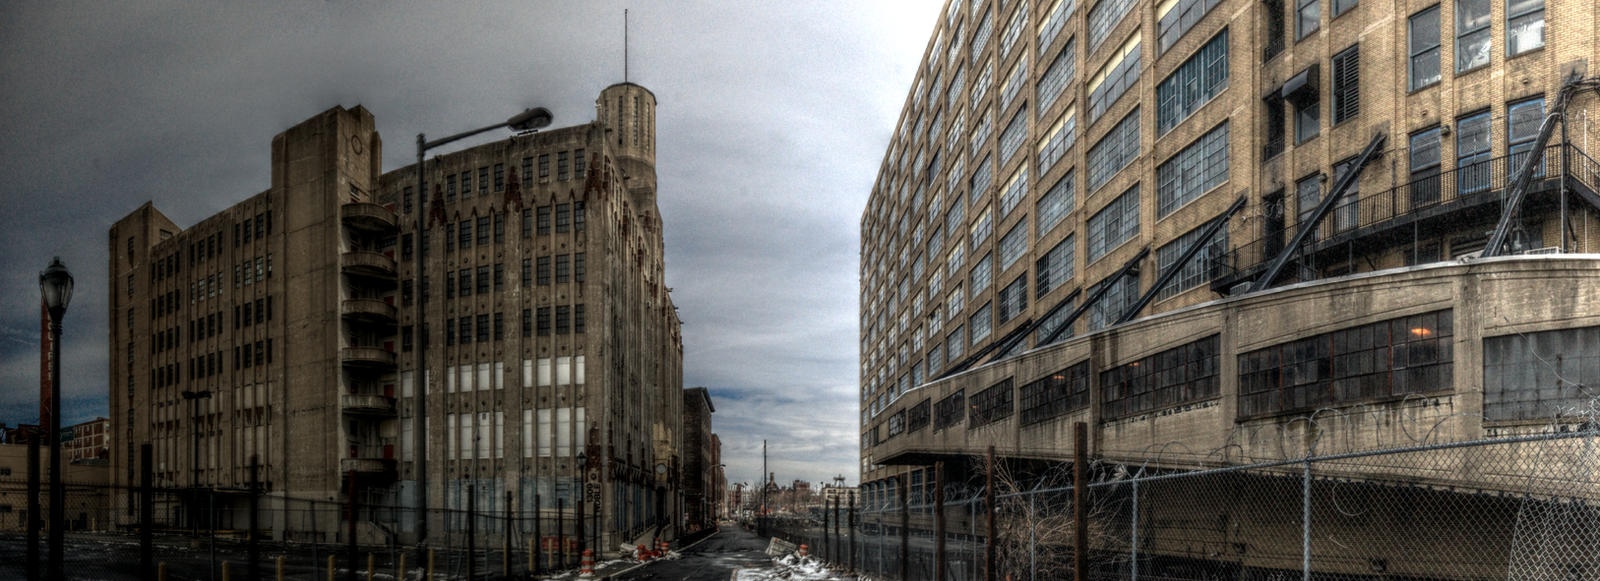 Panorama 3568 hdr pregamma 1 mantiuk06 contrast ma by bruhinb